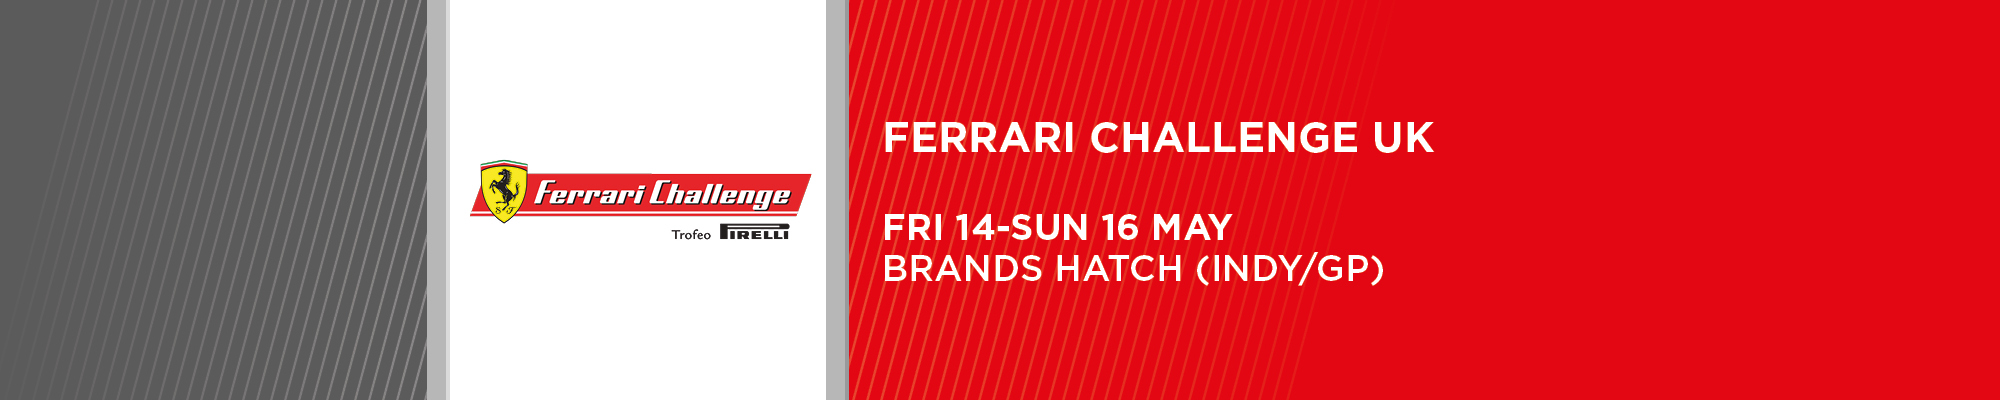 Ferrari Challenge UK - NO SPECTATORS